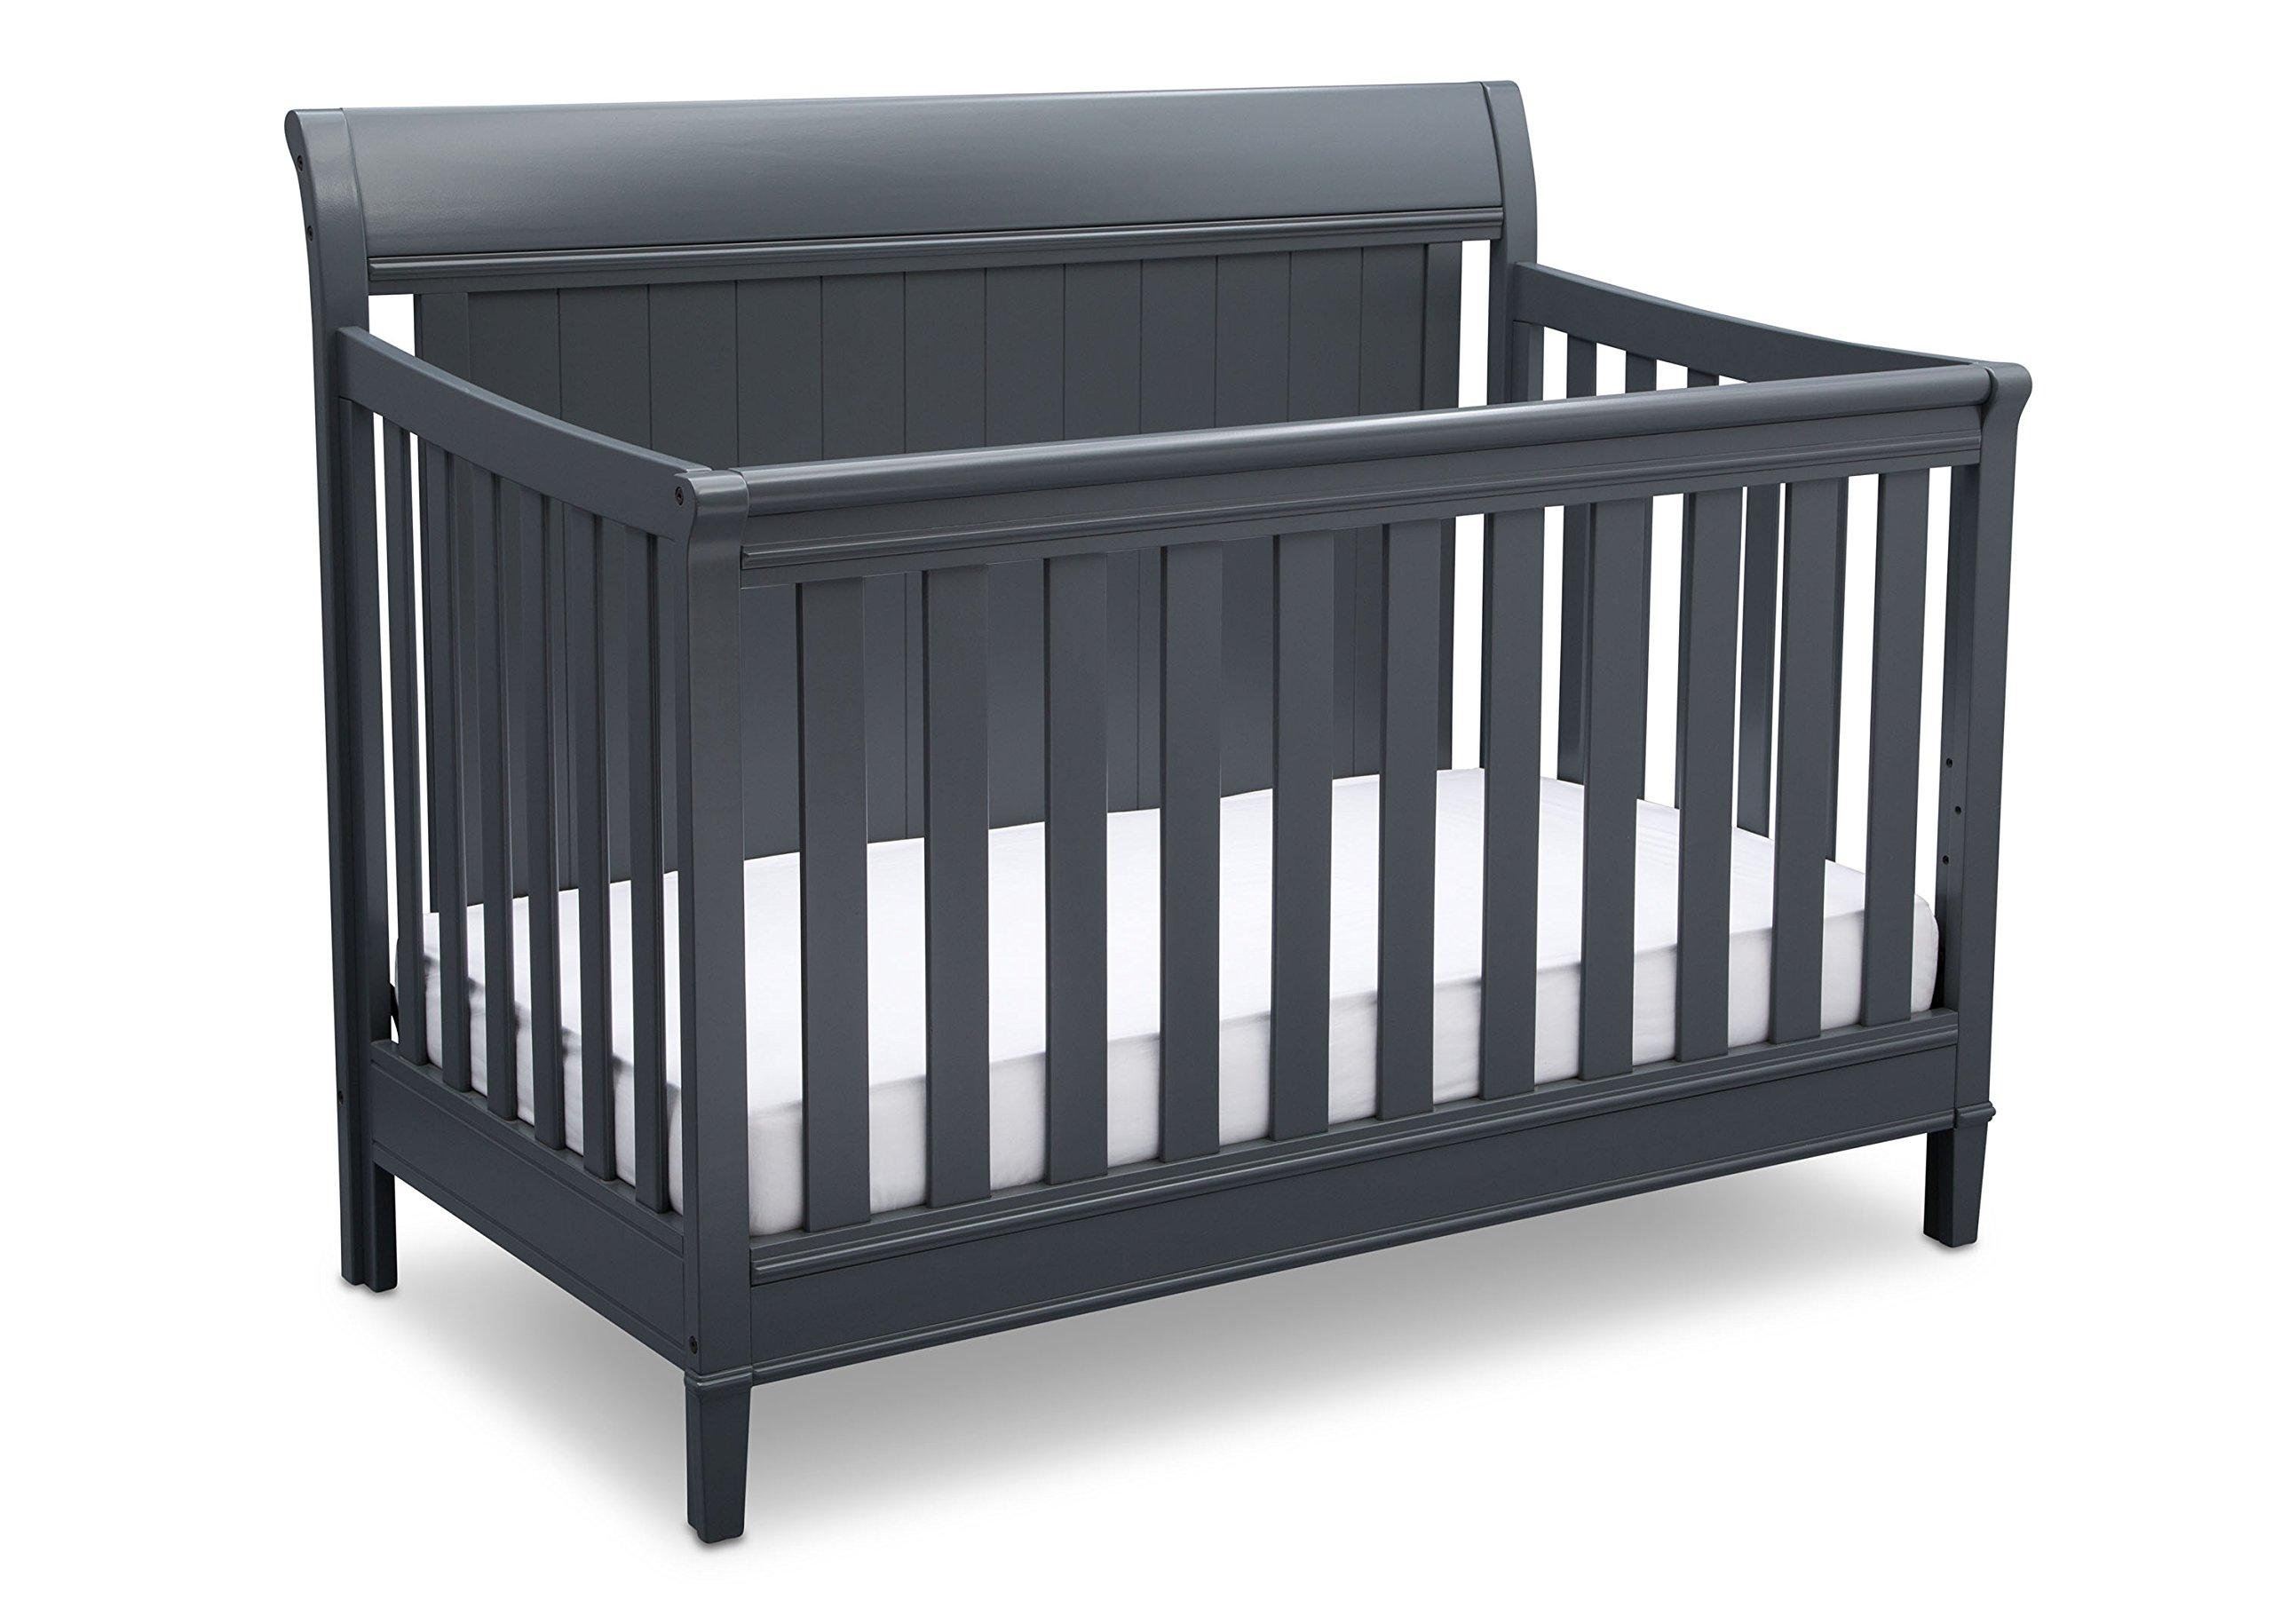 Delta Children New Haven 4-in-1 Convertible Crib, Charcoal Grey